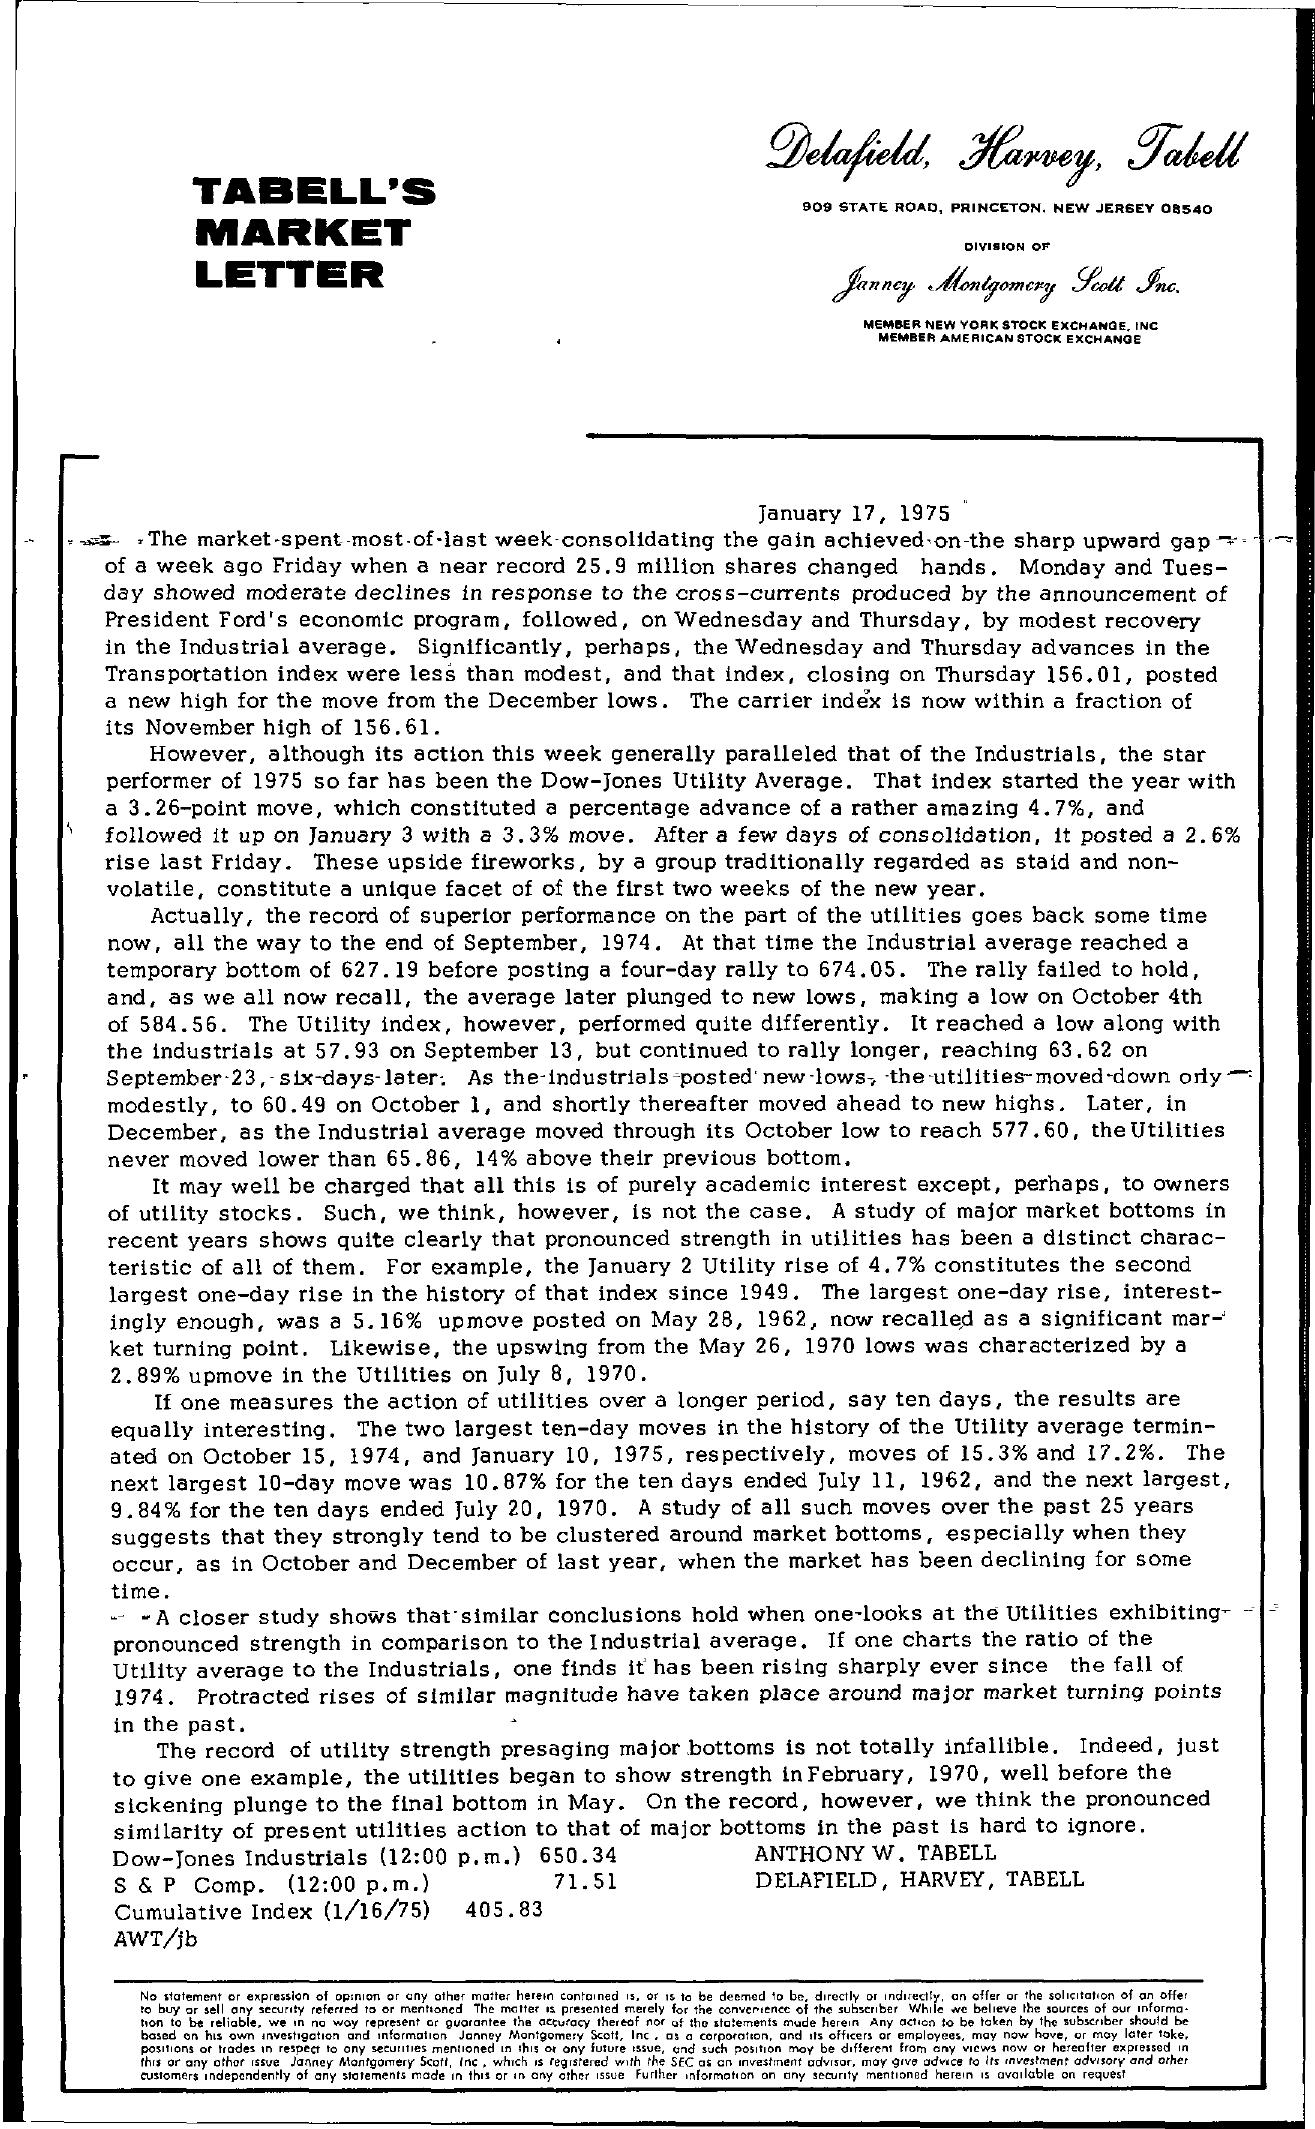 Tabell's Market Letter - January 17, 1975